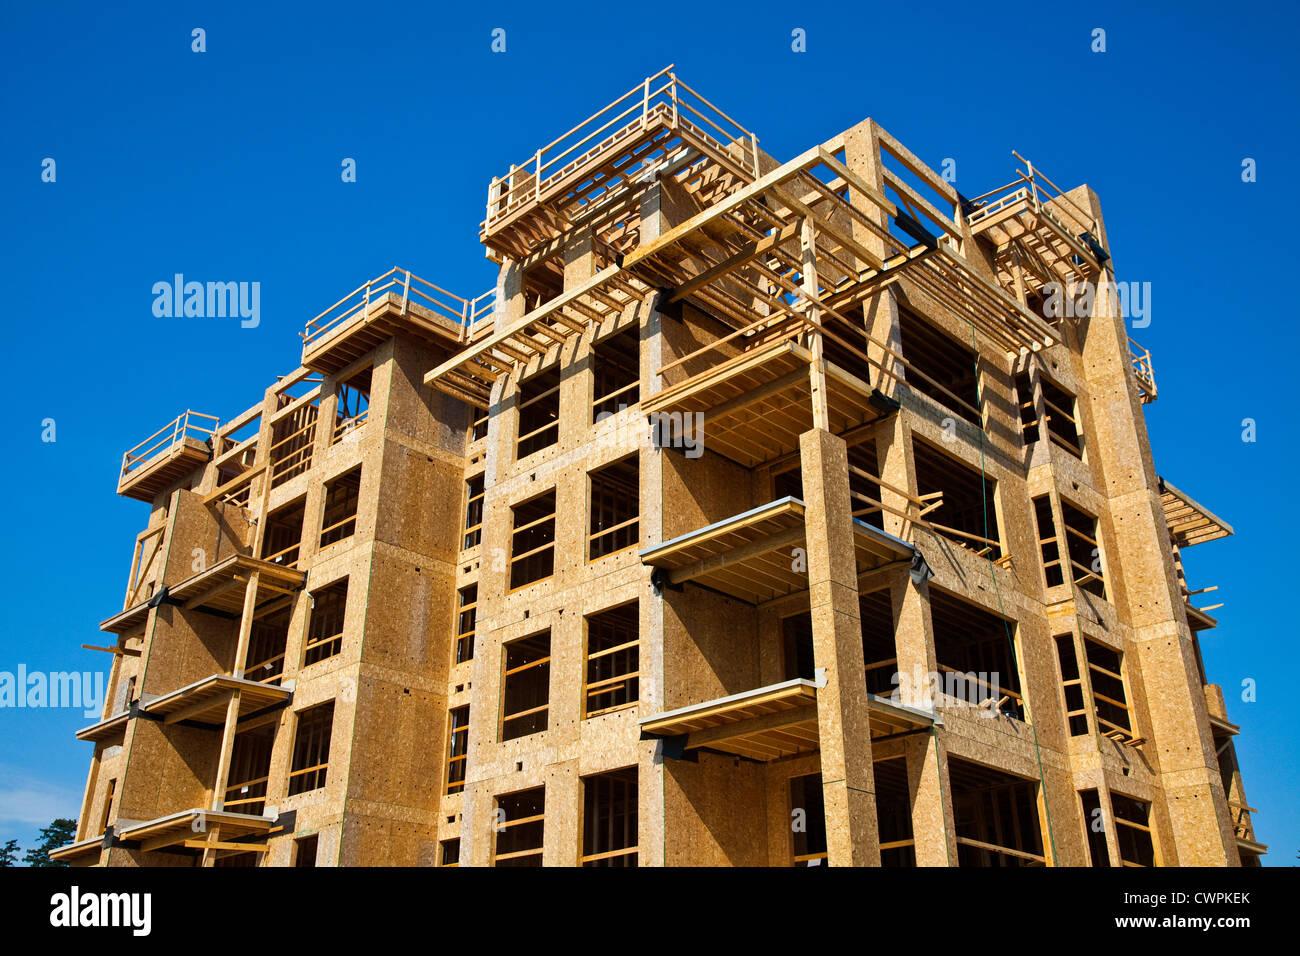 Wood Frame Construction Stock Photos & Wood Frame Construction Stock ...